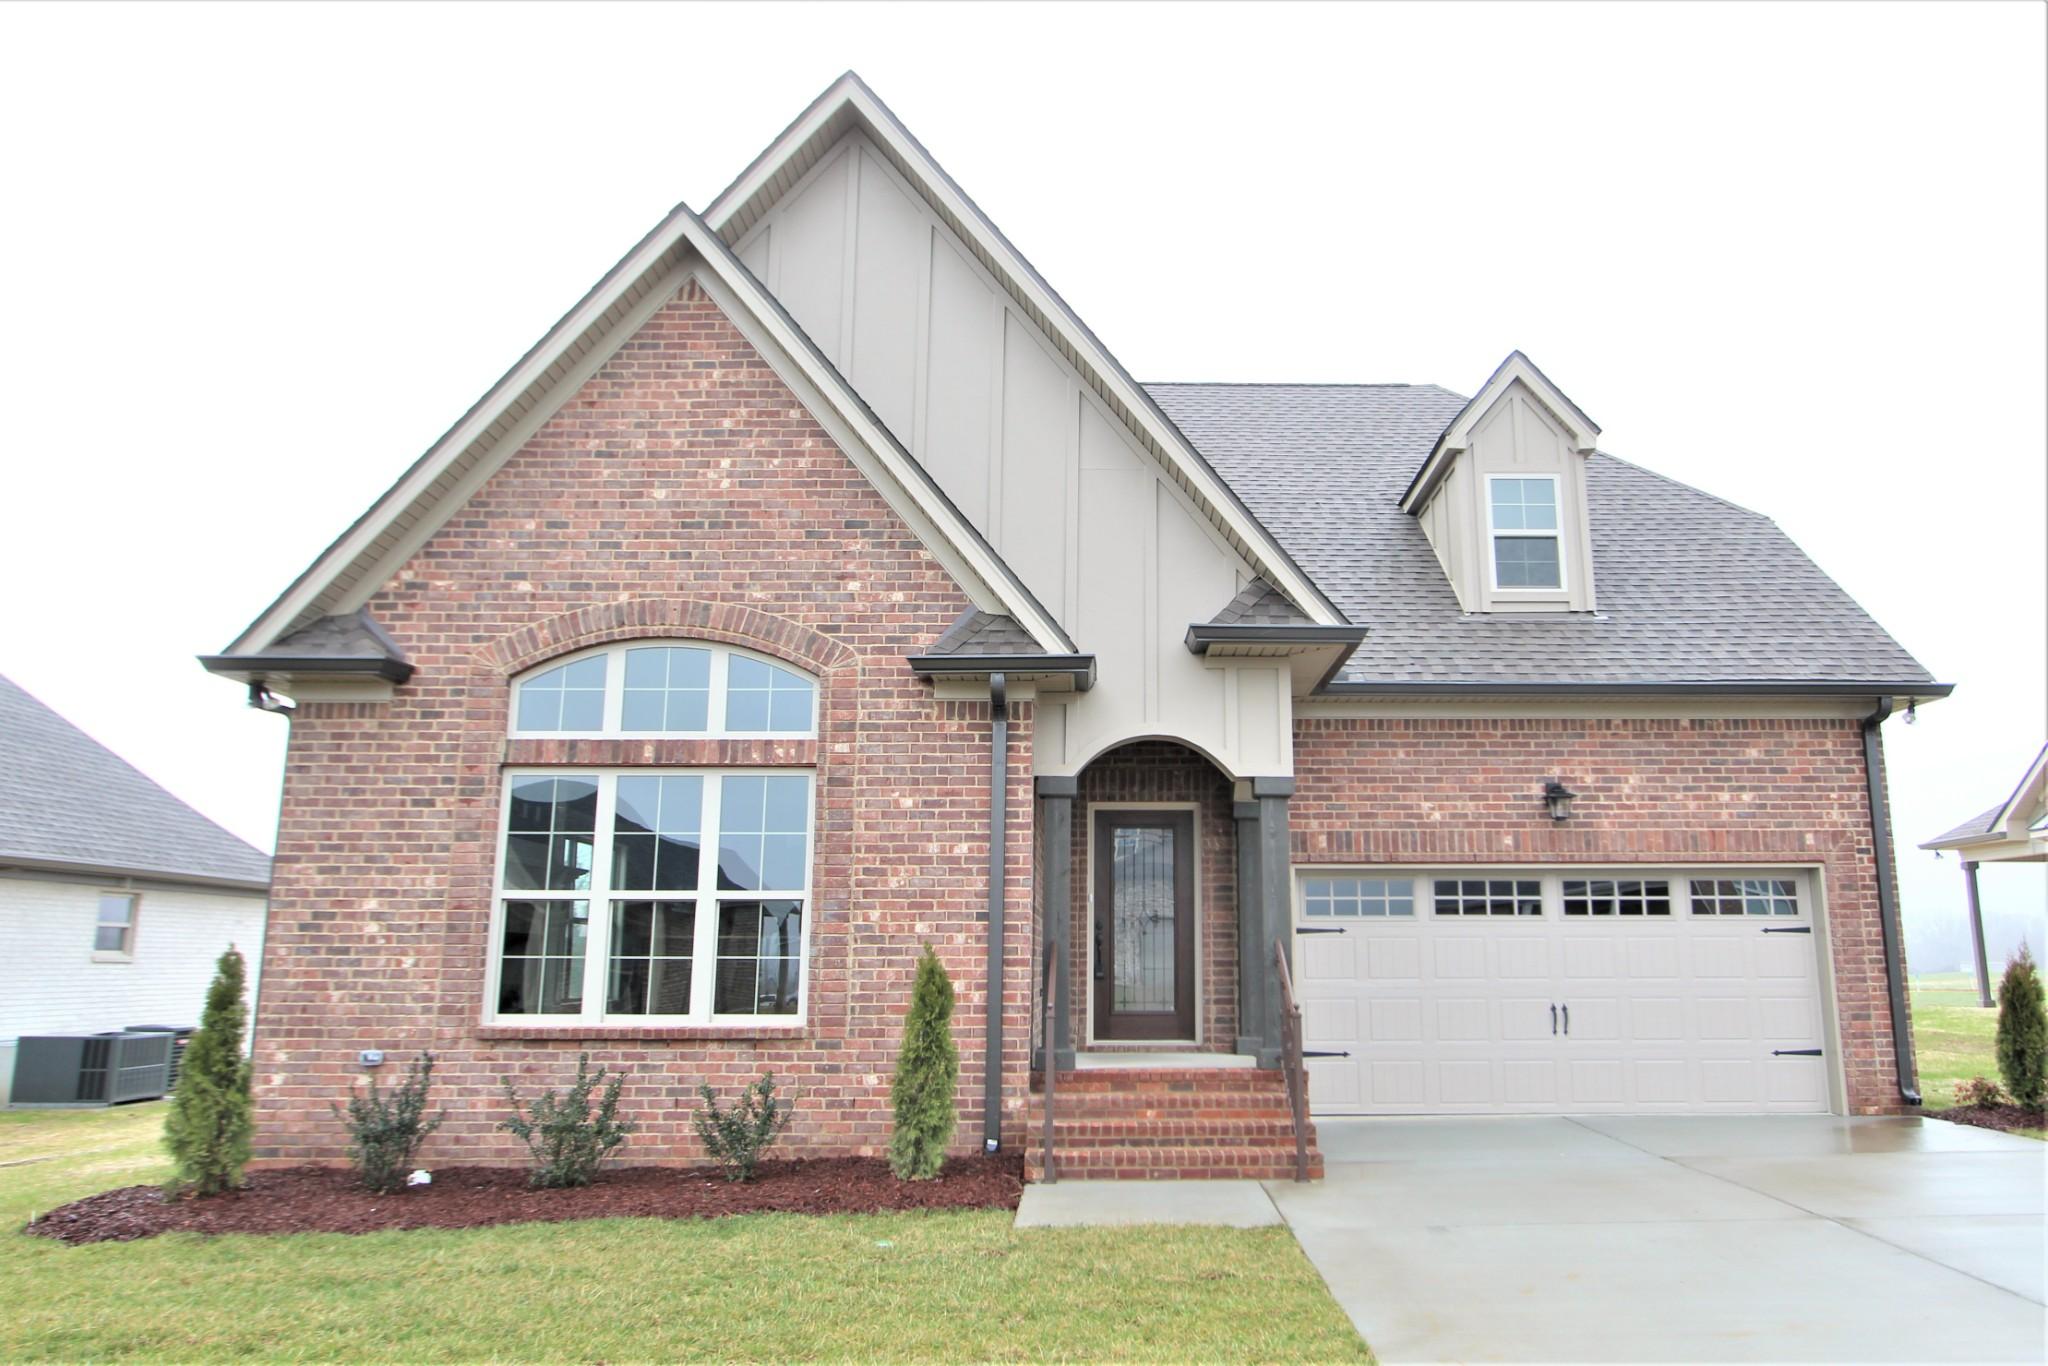 805 Ella Lane #39, Clarksville, TN 37043 - Clarksville, TN real estate listing